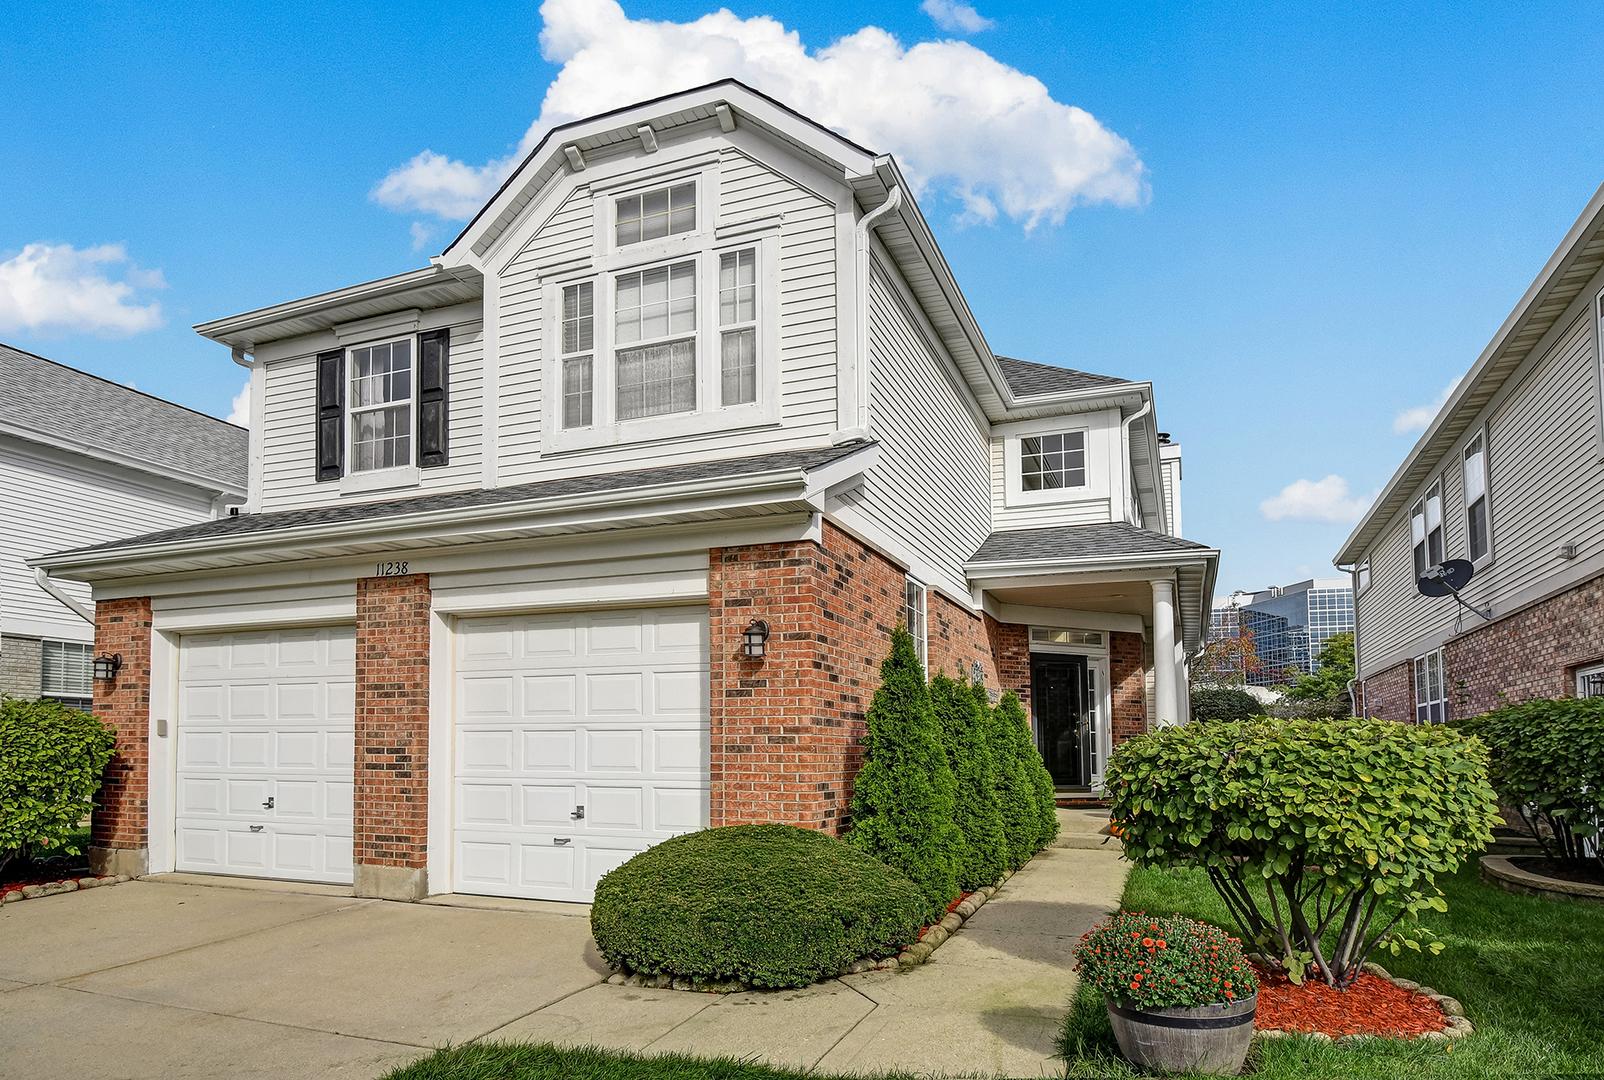 11238 Wildridge, Westchester, Illinois, 60154